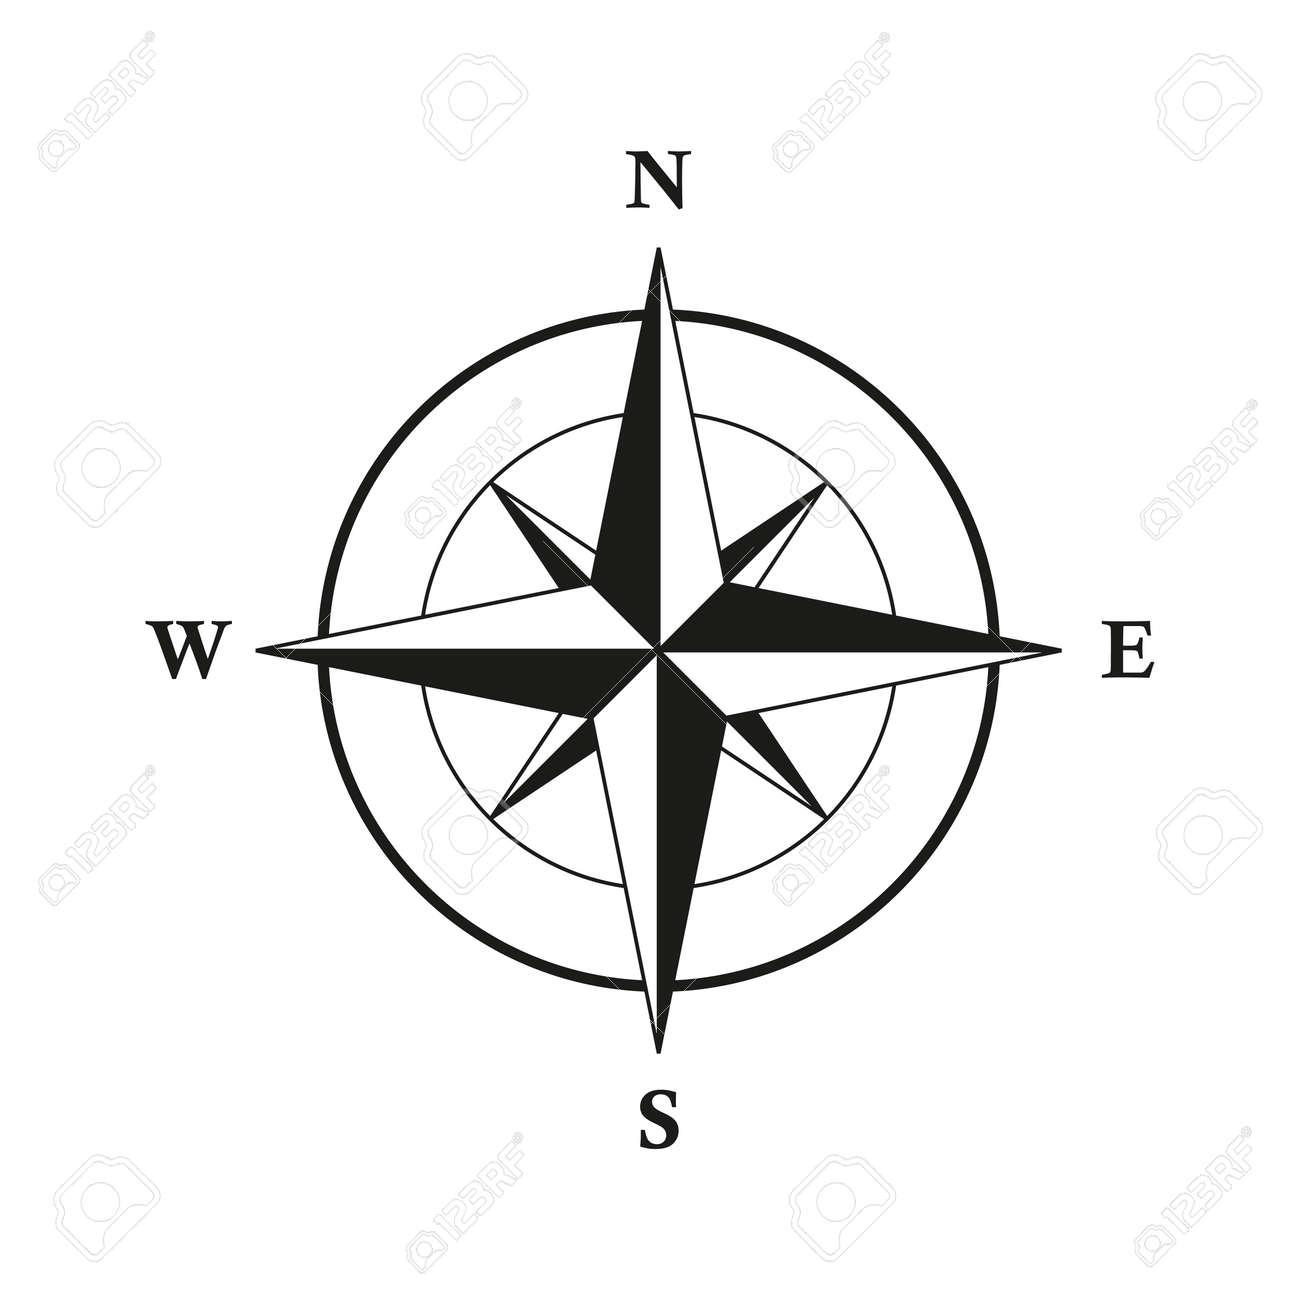 basic compass wind rose isolated on white background - 167505125